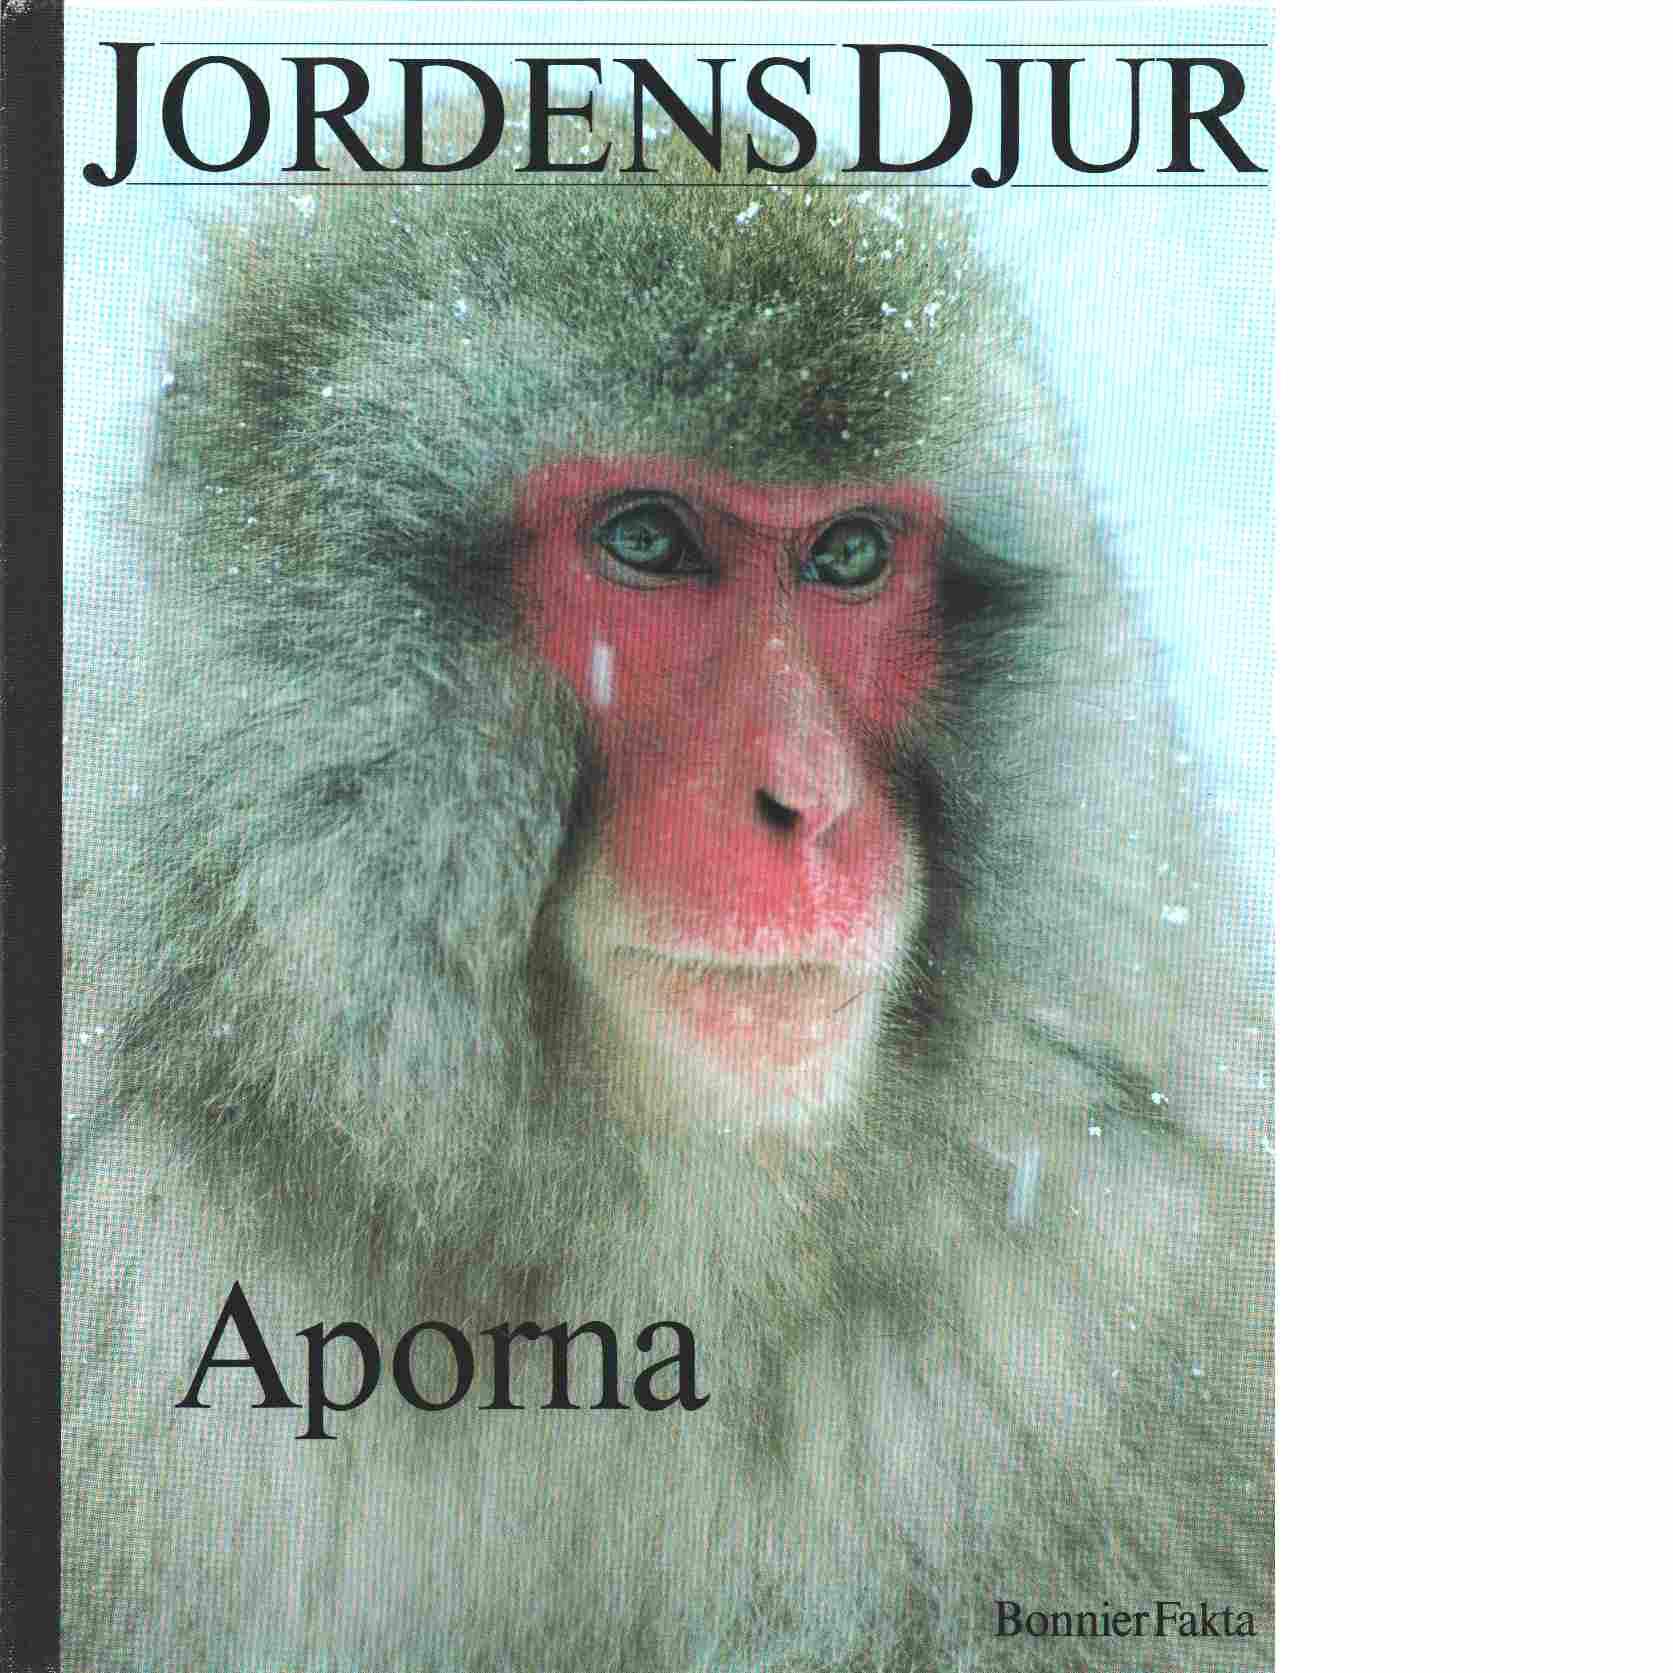 Jordens djur. 3, Aporna - Red.